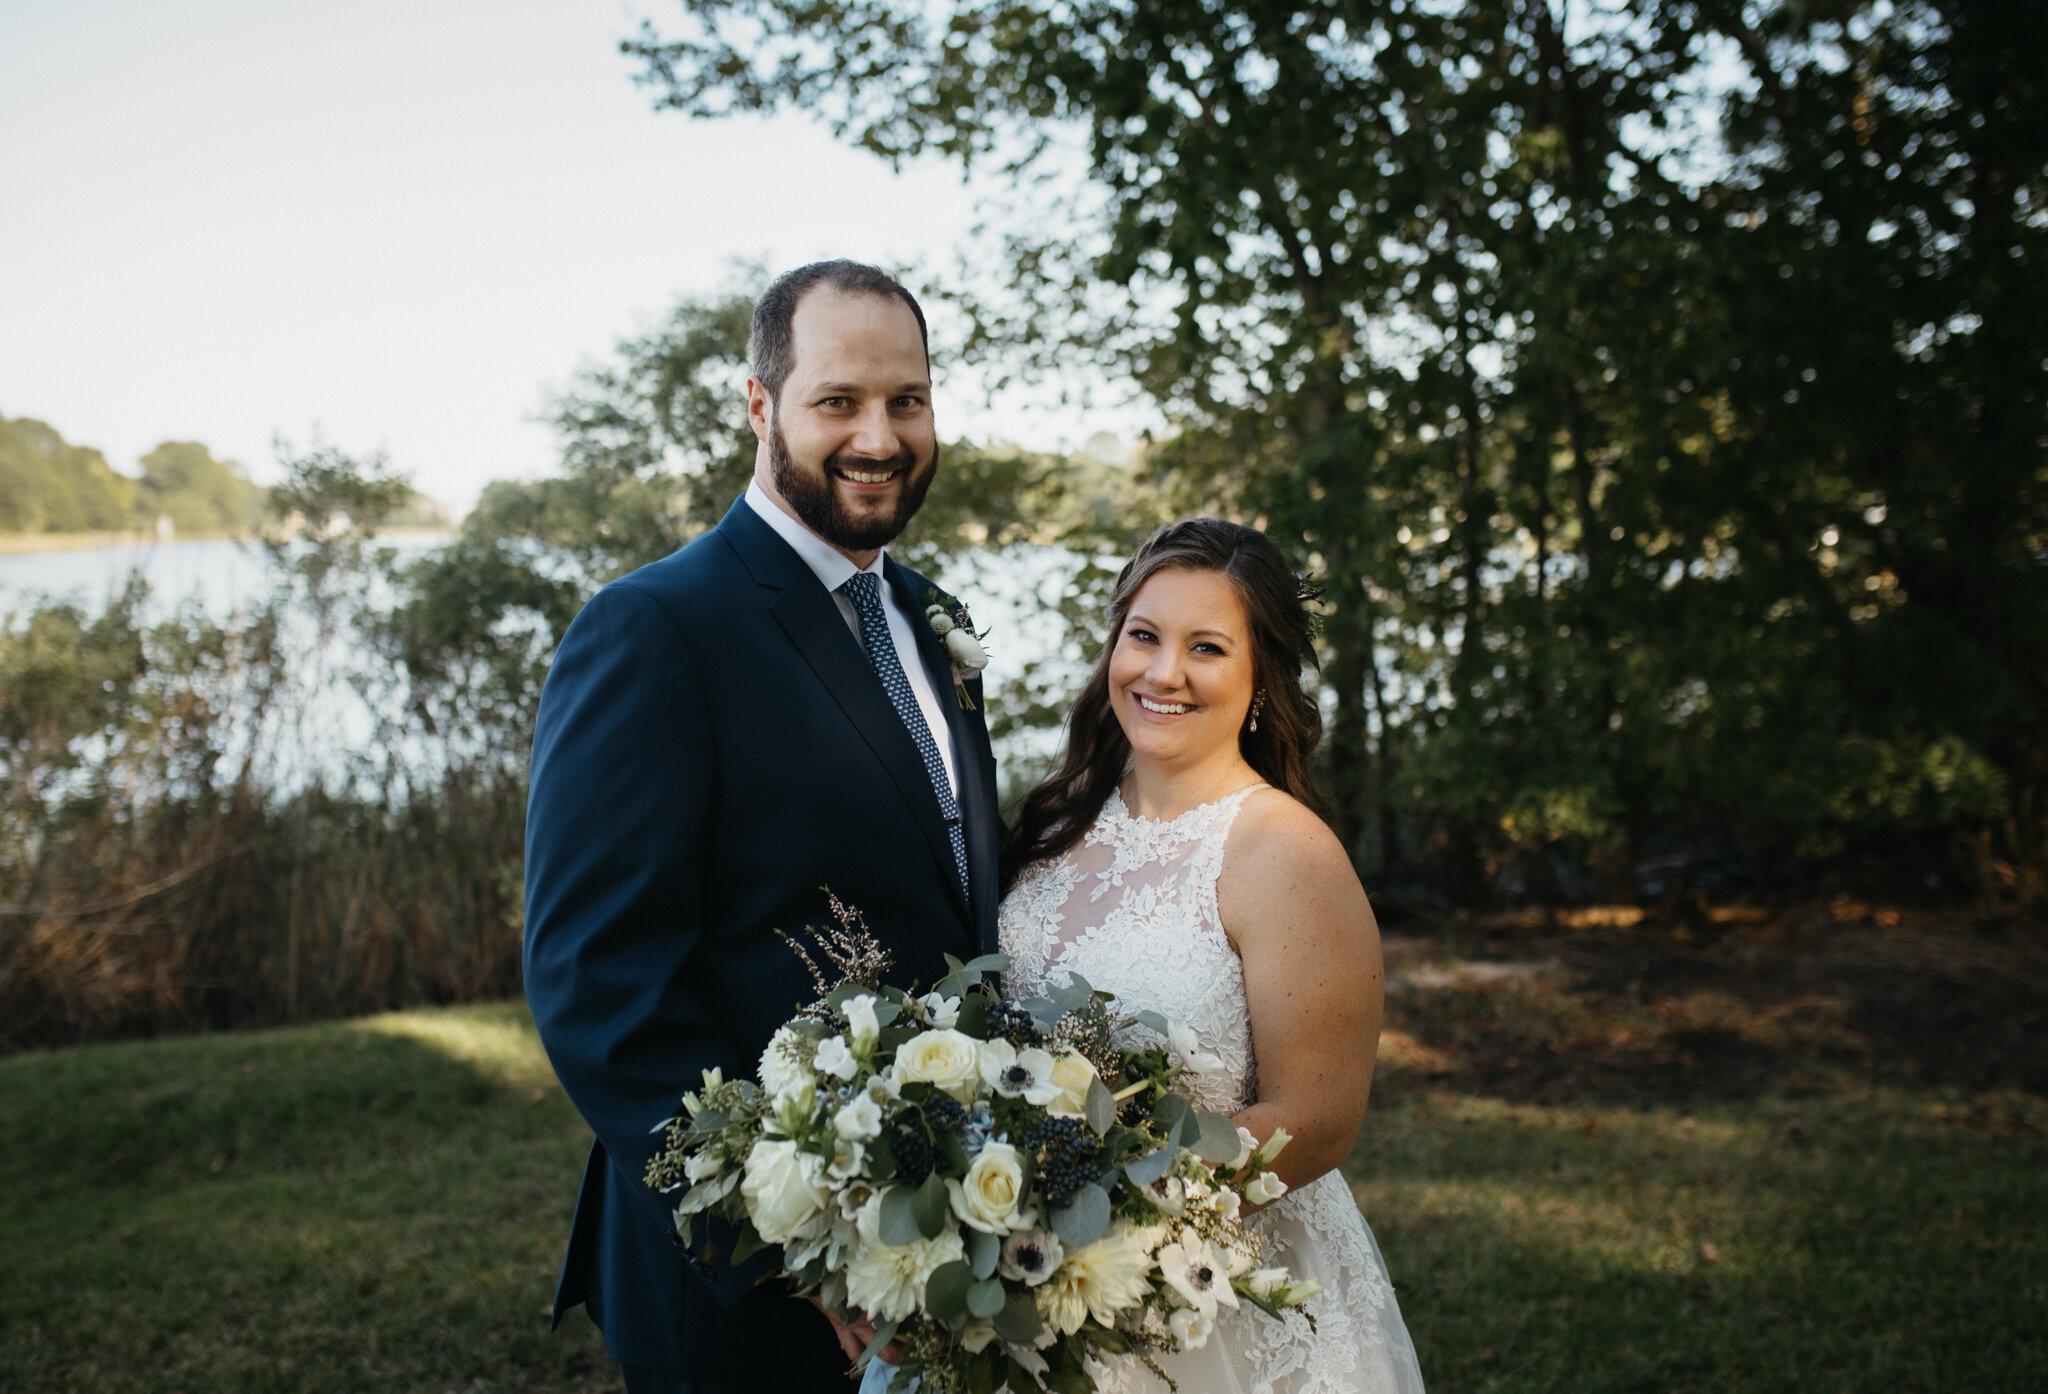 angela_jason_norfolk_wedding-56.jpg